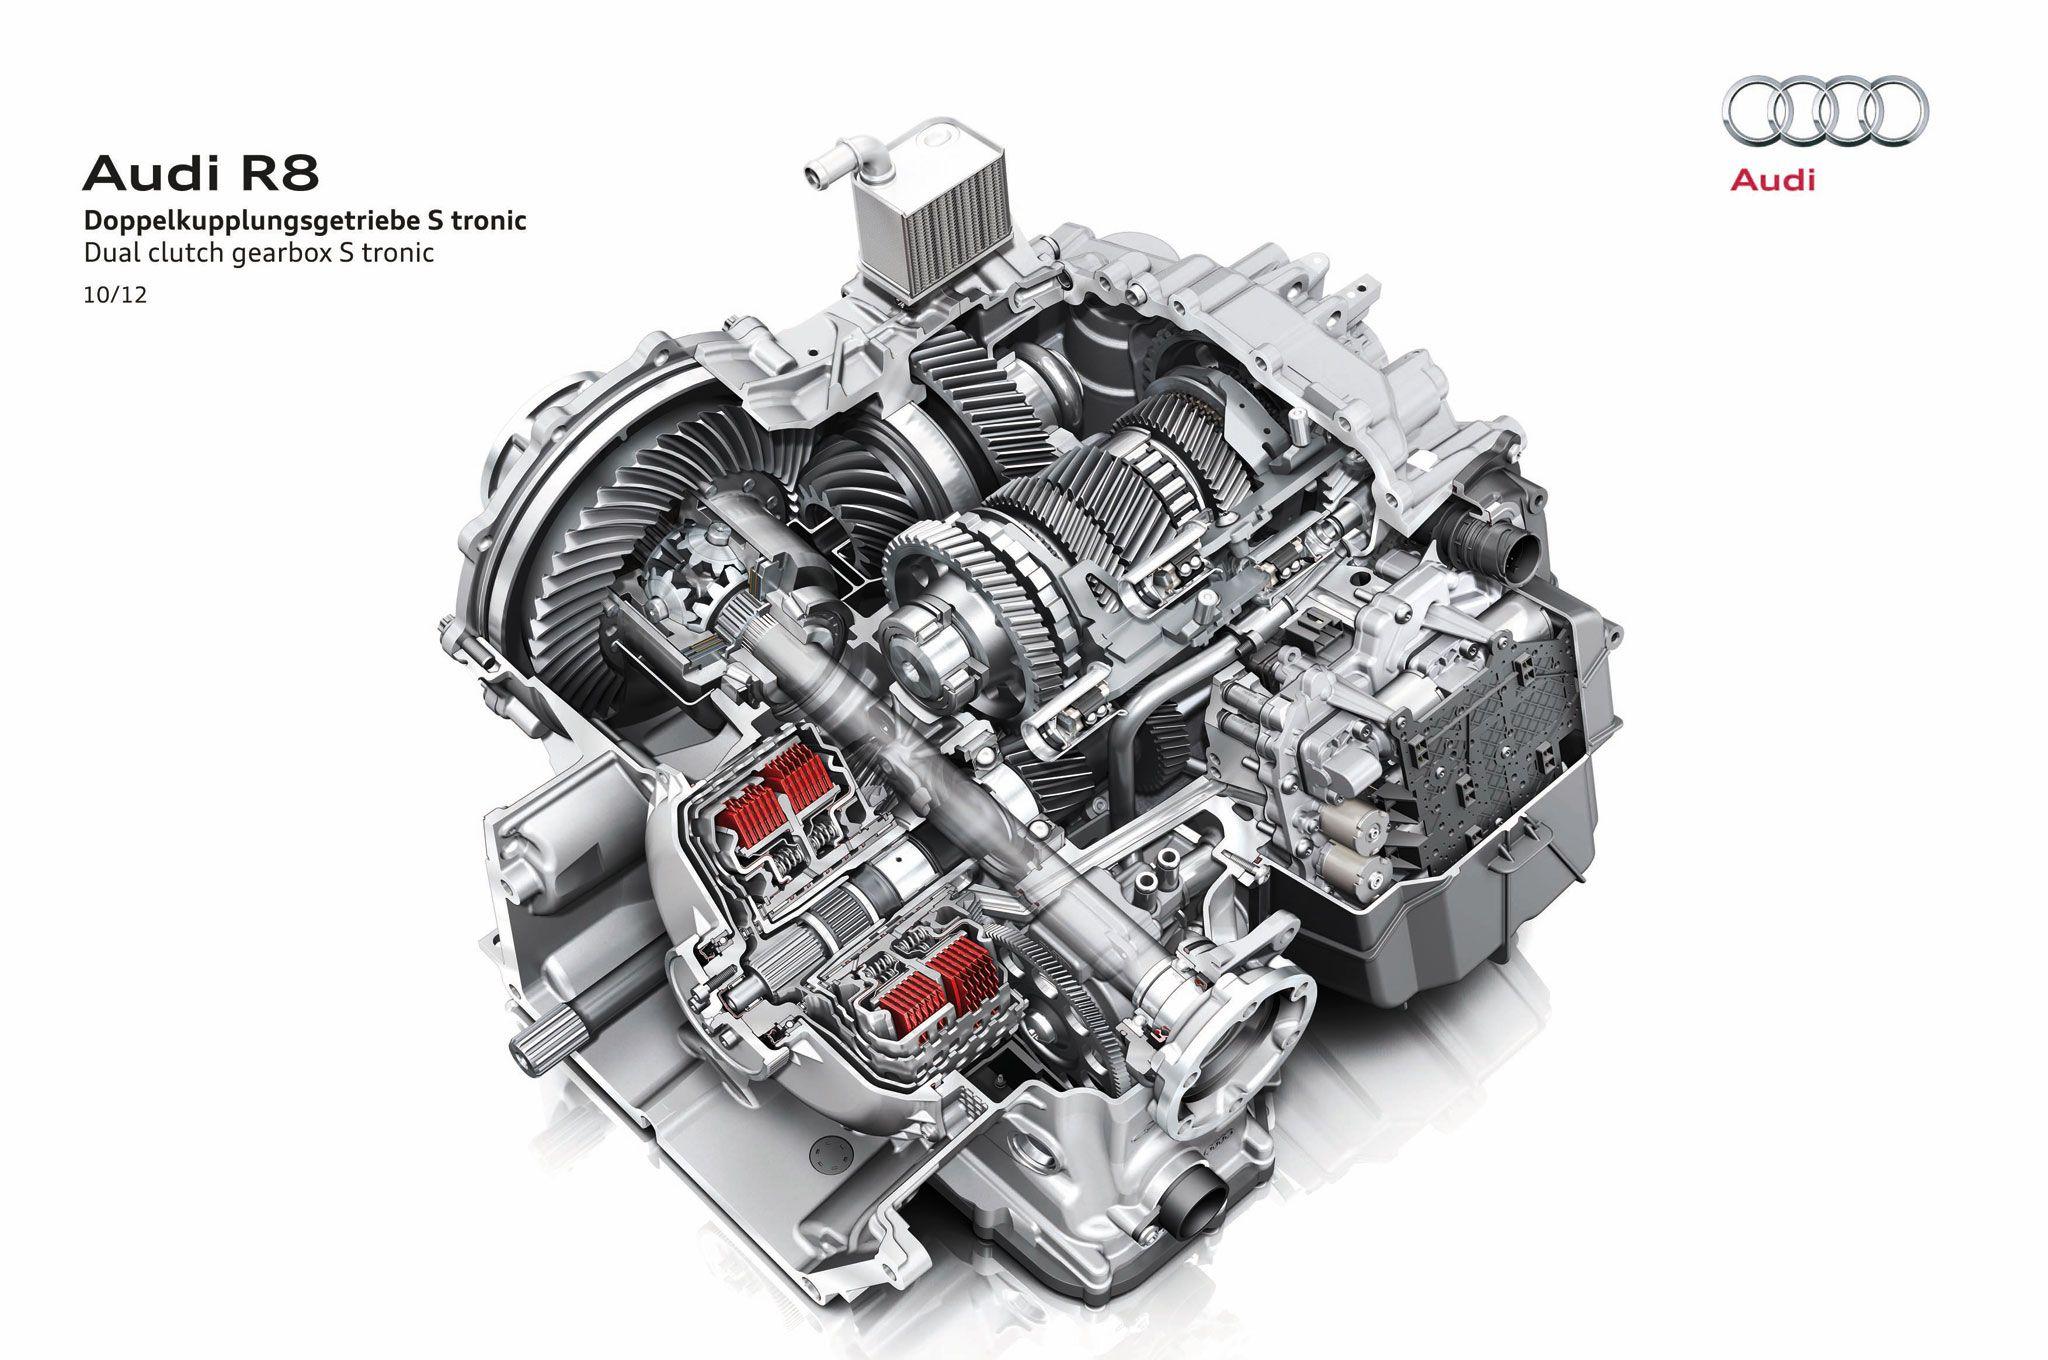 Related image | transaxles | Audi r8, Audi, Audi r8 v10